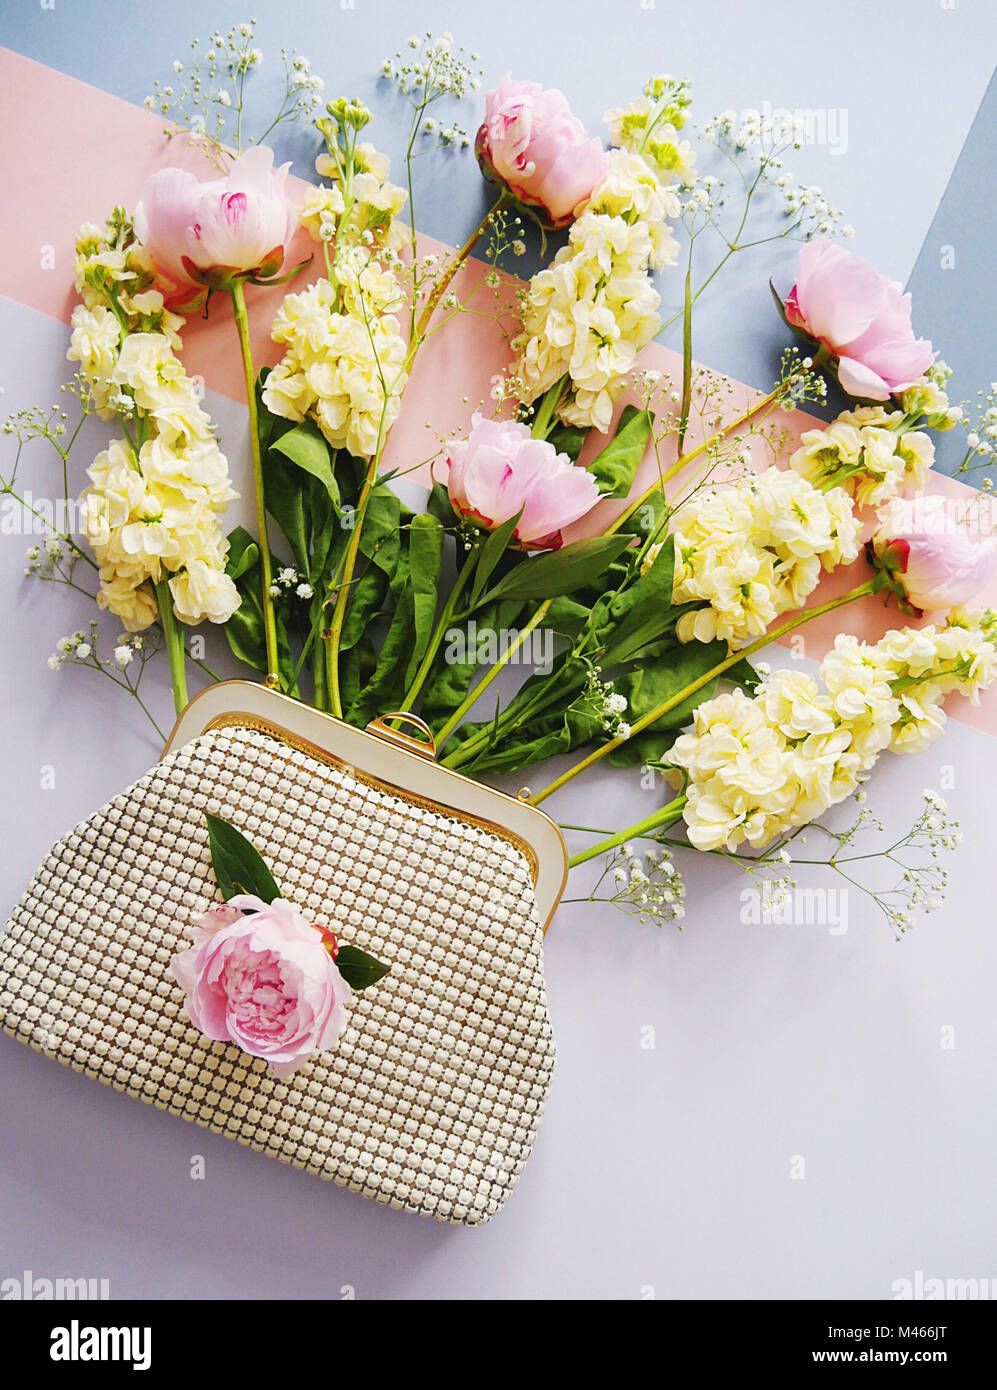 Alternative Bouquet Stock Photos & Alternative Bouquet Stock Images ...